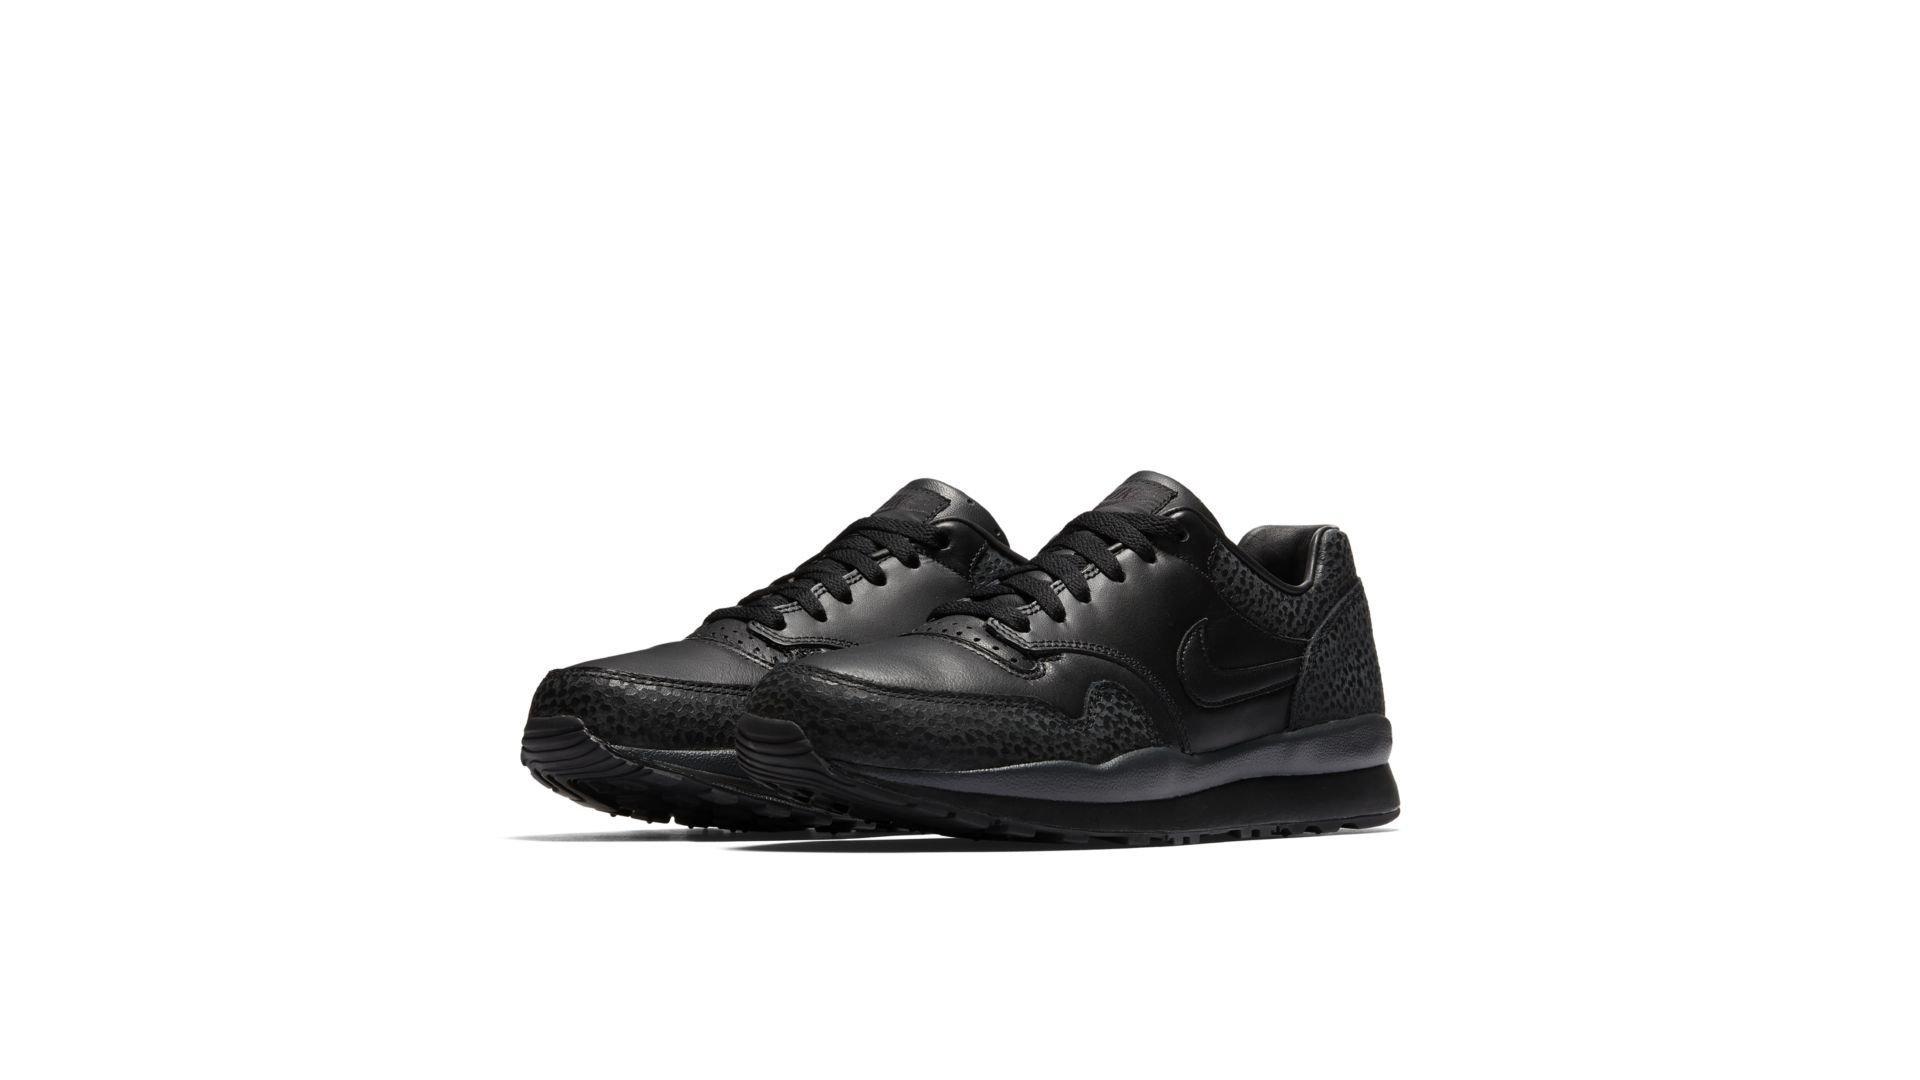 Nike Air Safari Black Anthracite (AO3295-002)